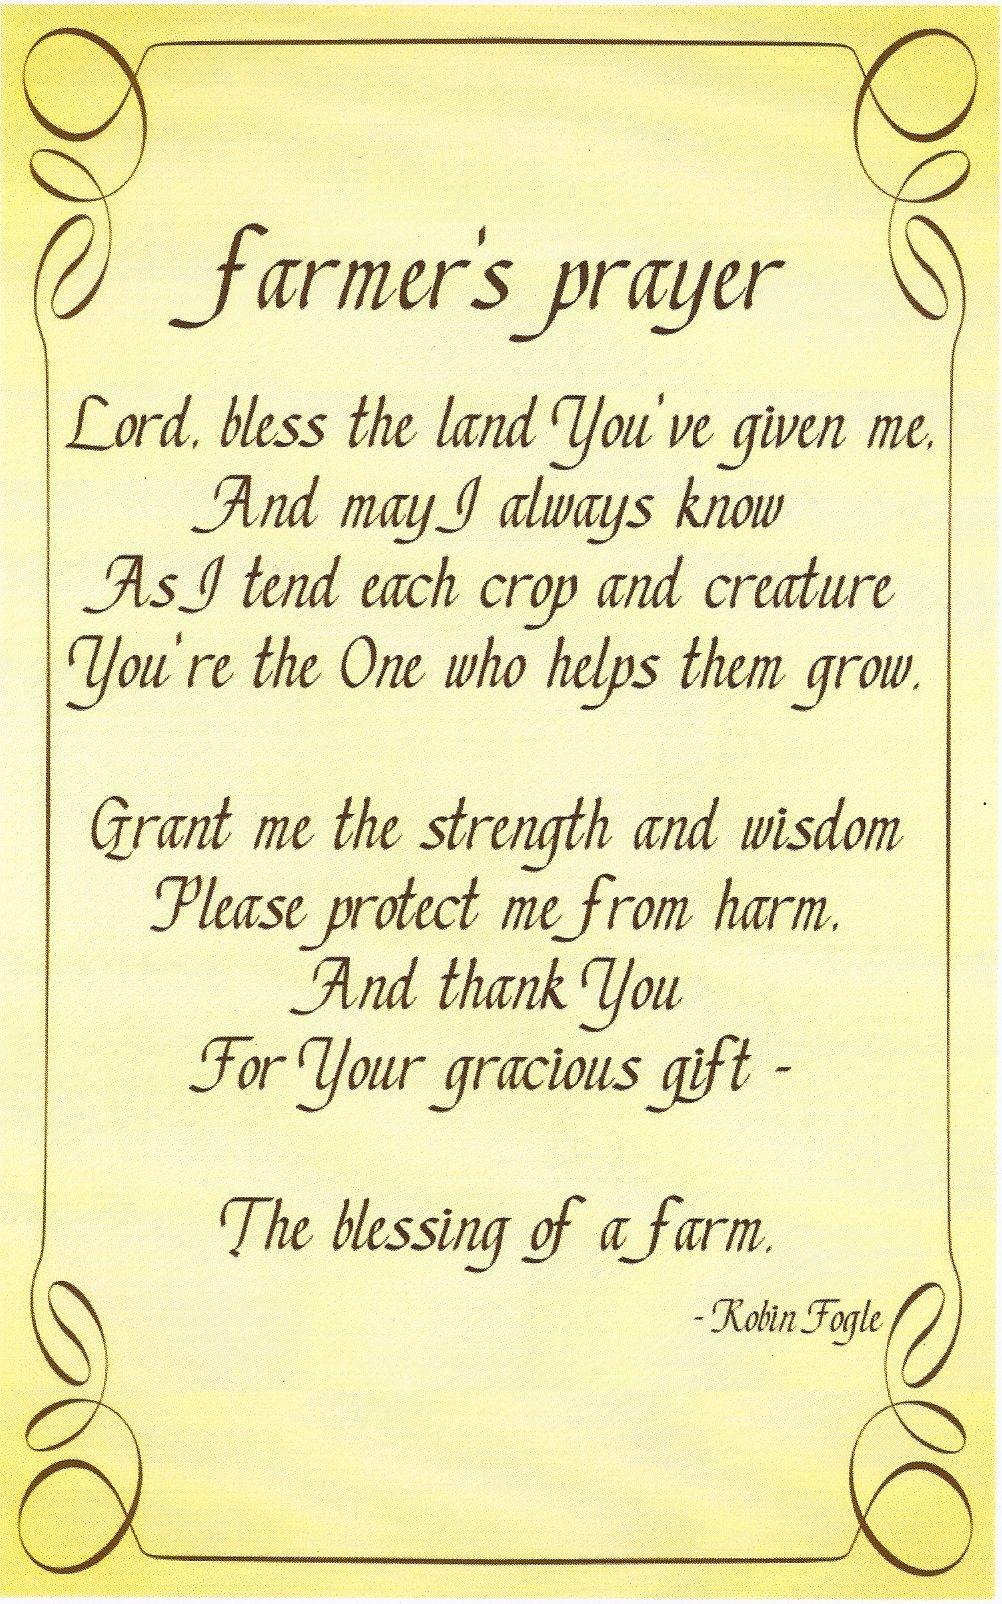 Farm Life Quotes 8F990D2Ff2678Fb534E1A19C2Dd5Be4E 1002×1604 Pixels